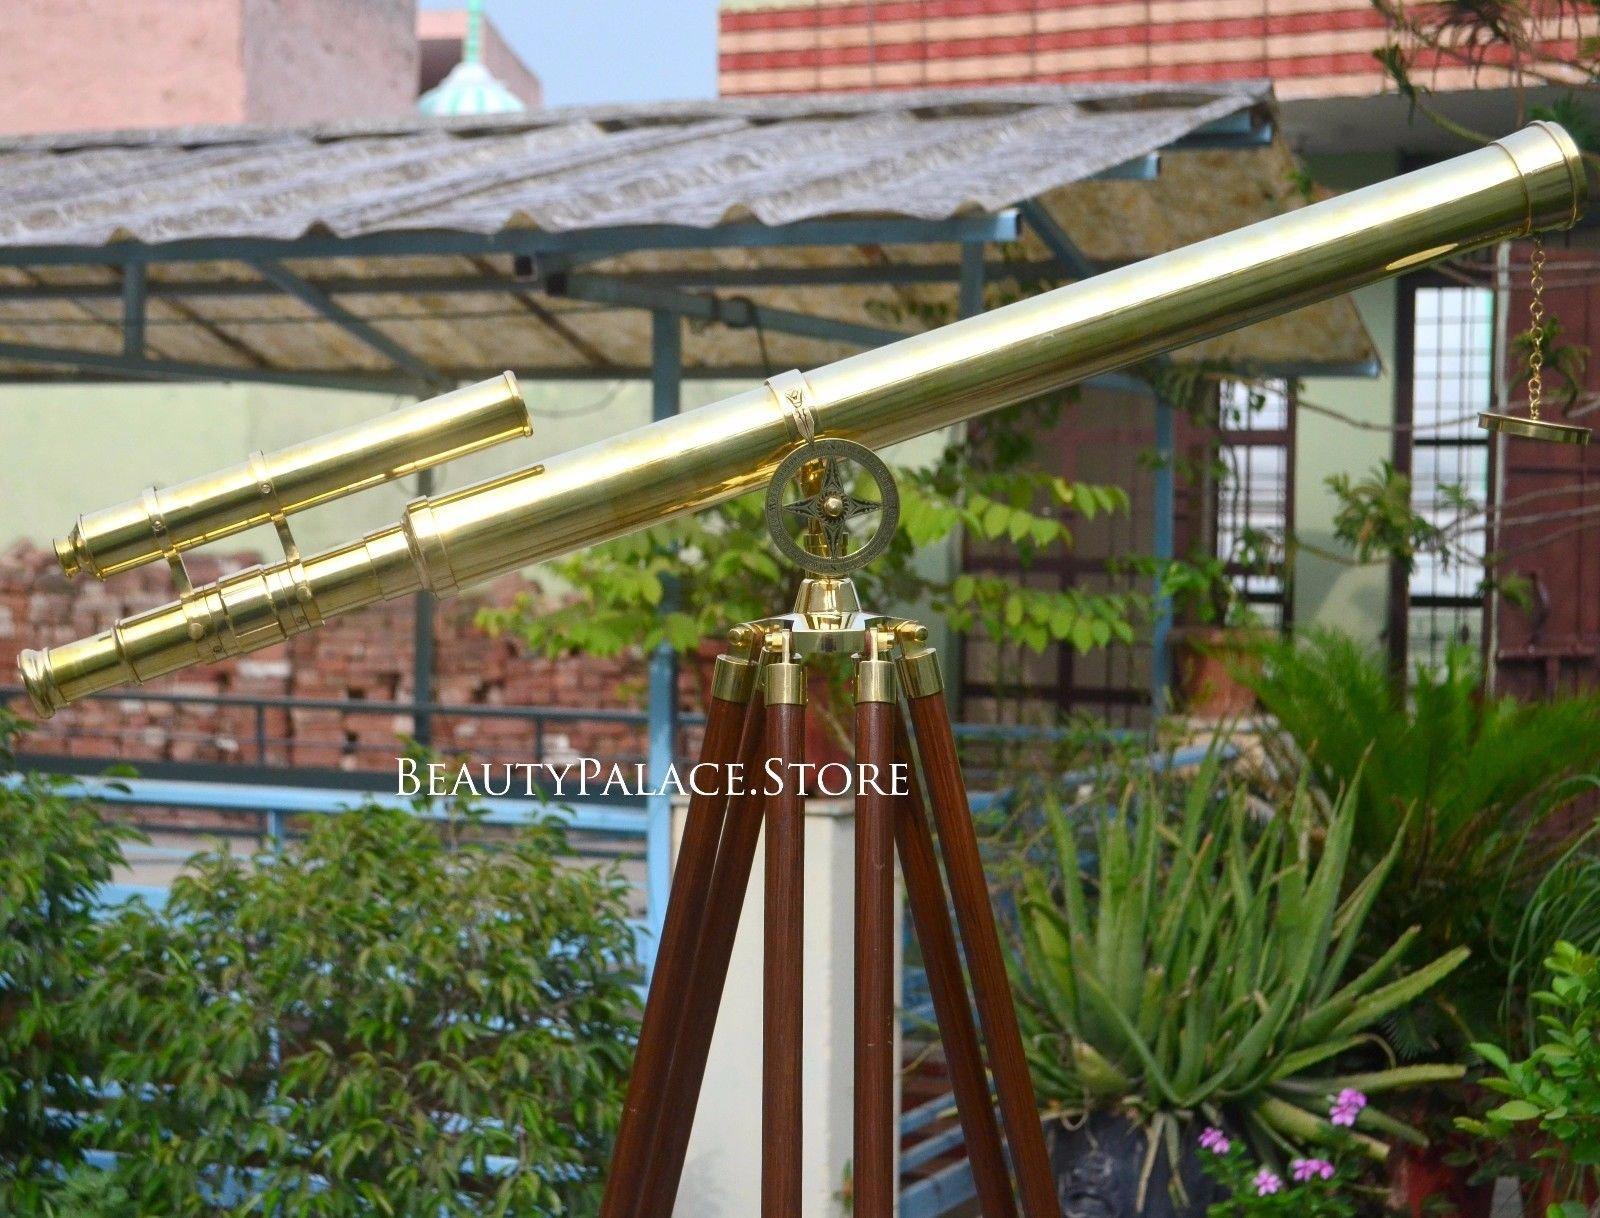 Maritime Telescope Beautiful Brass Double Barrel Nautical Telescope 62'' High On Wooden Tripod Handcrafted